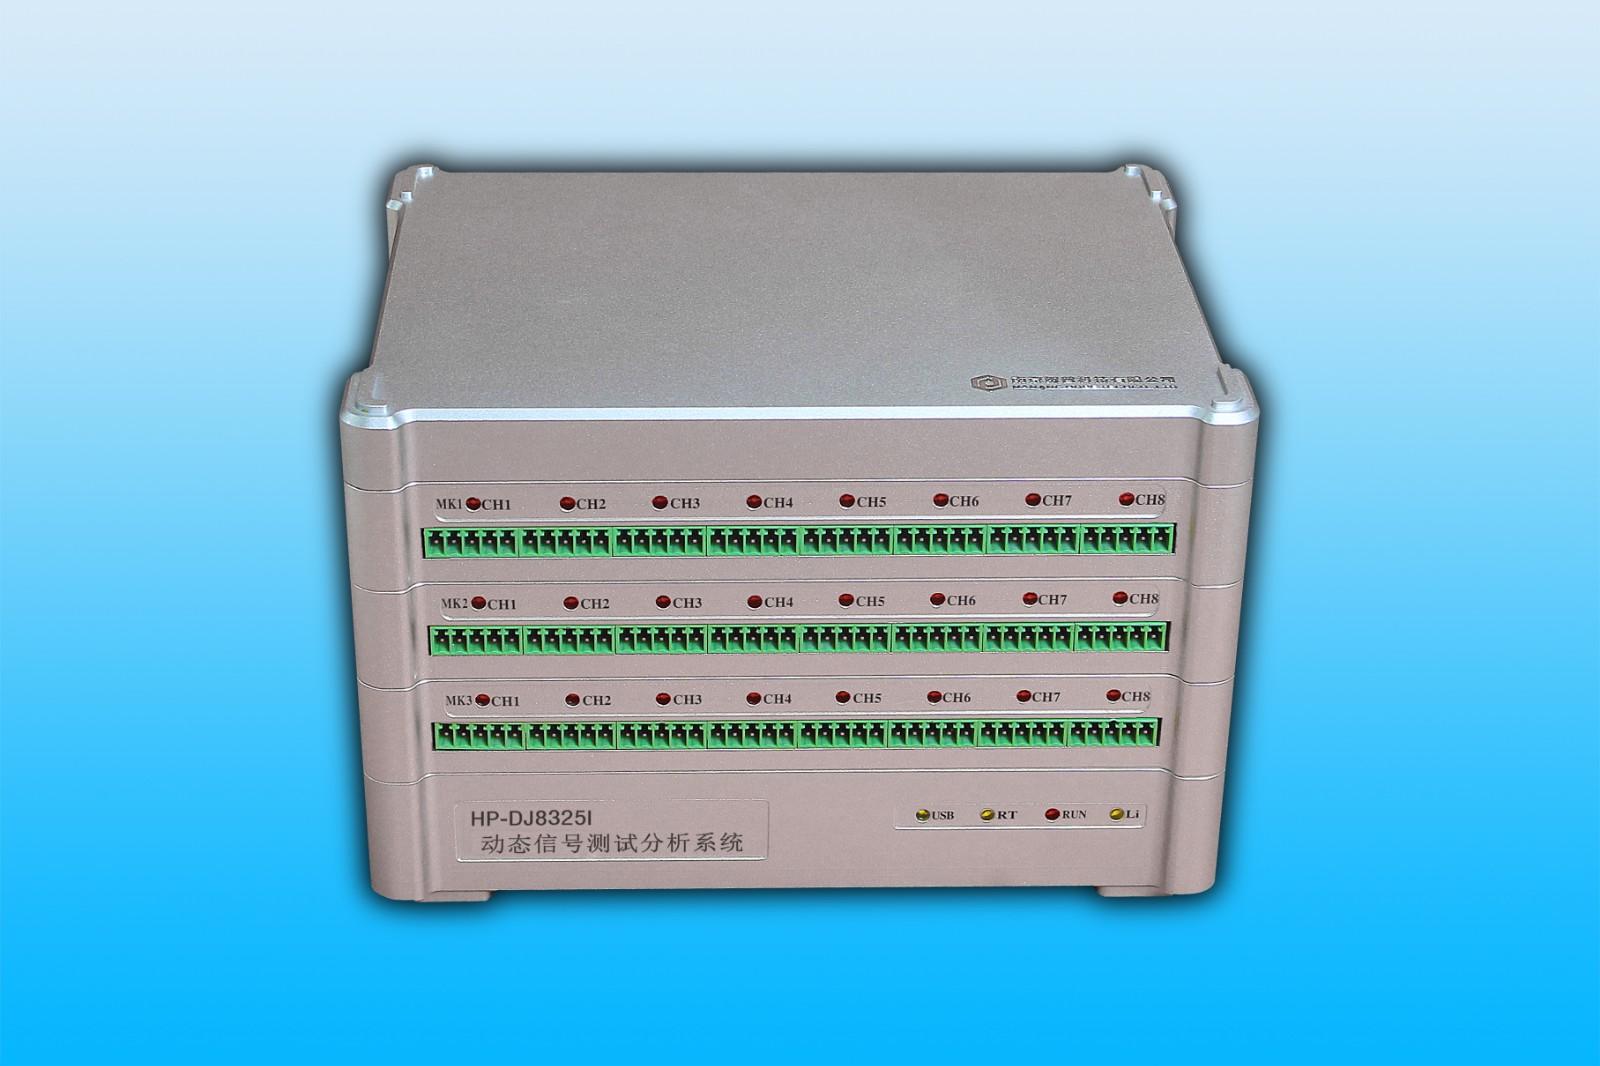 HP-DJ8325I 动态信号测试分析系统